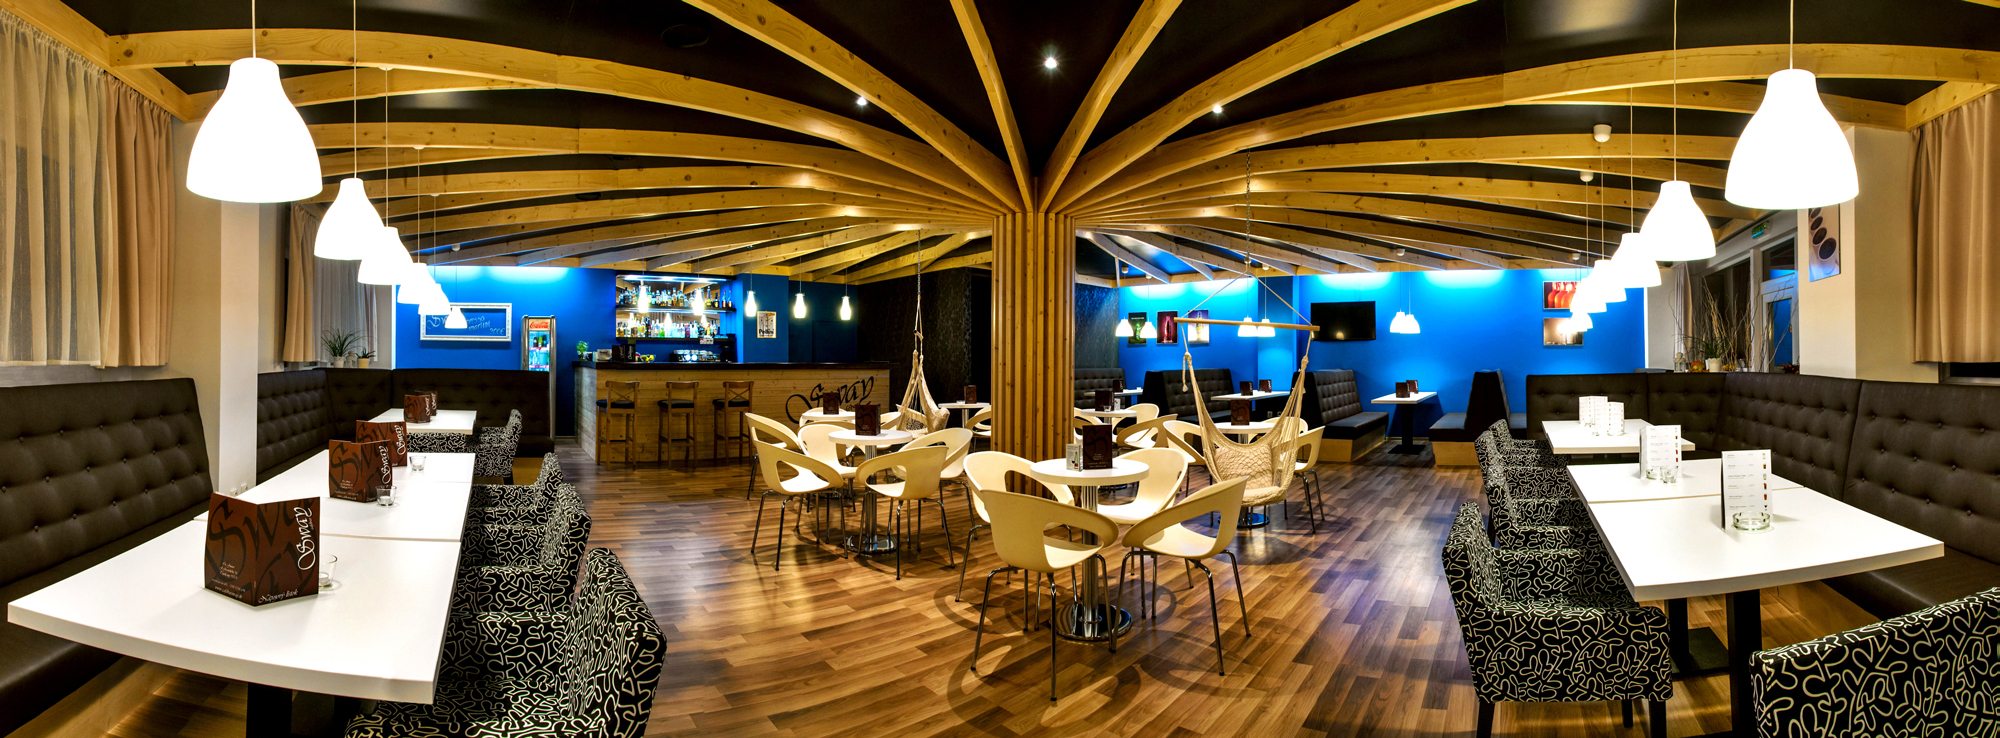 Rekonštrukcia barovej časti v CAFE BAR SWAY